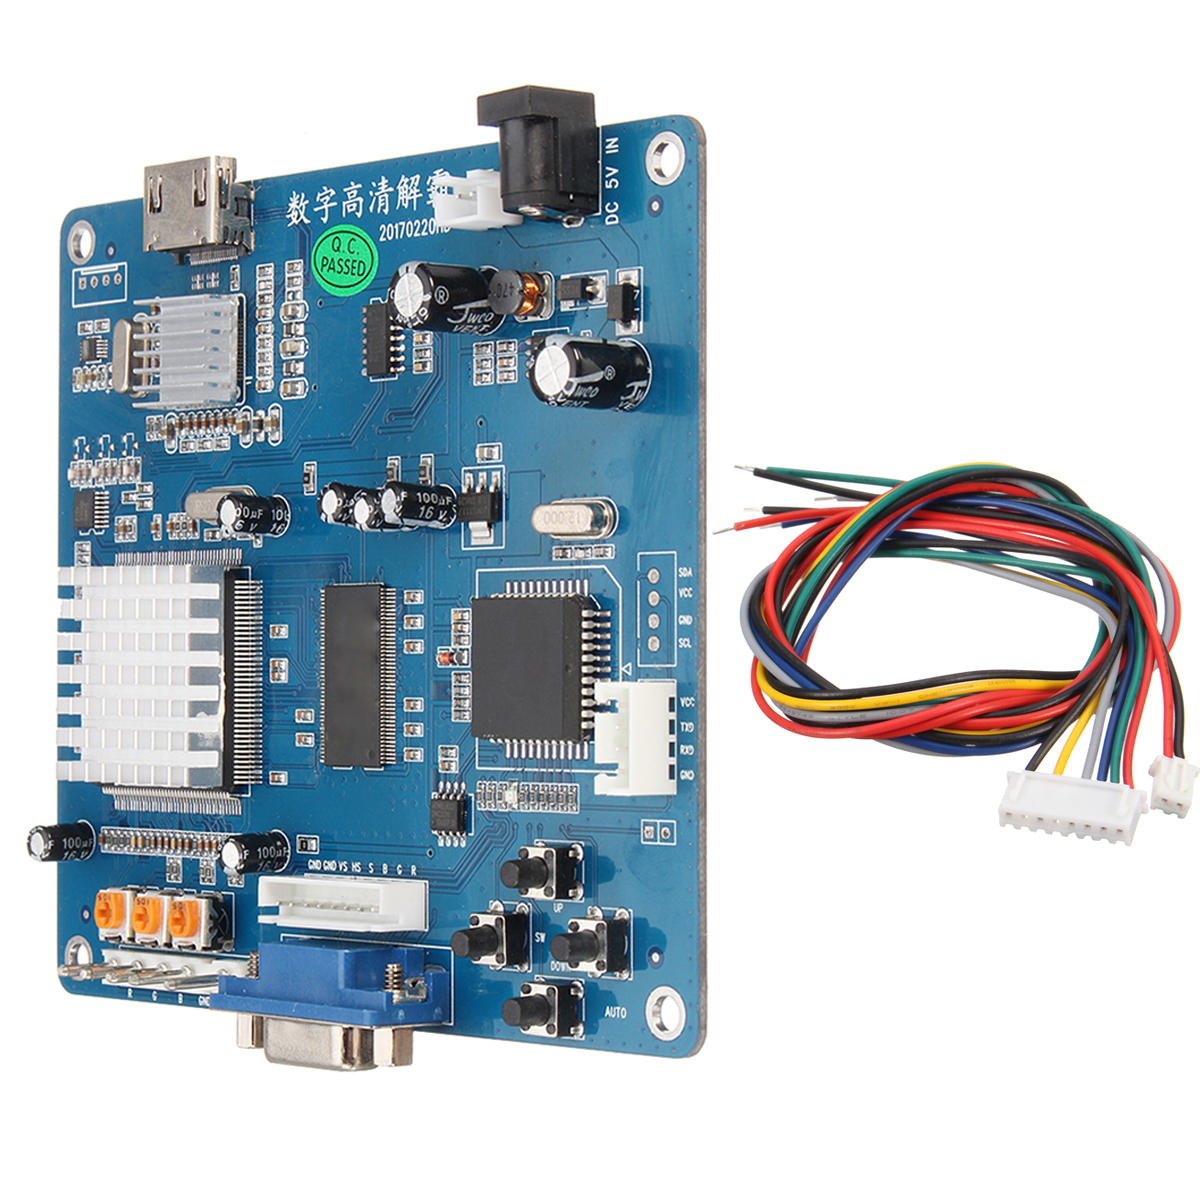 VGA/RGB/CGA/EGA/YUV to HD Arcade Game Video Output Converter